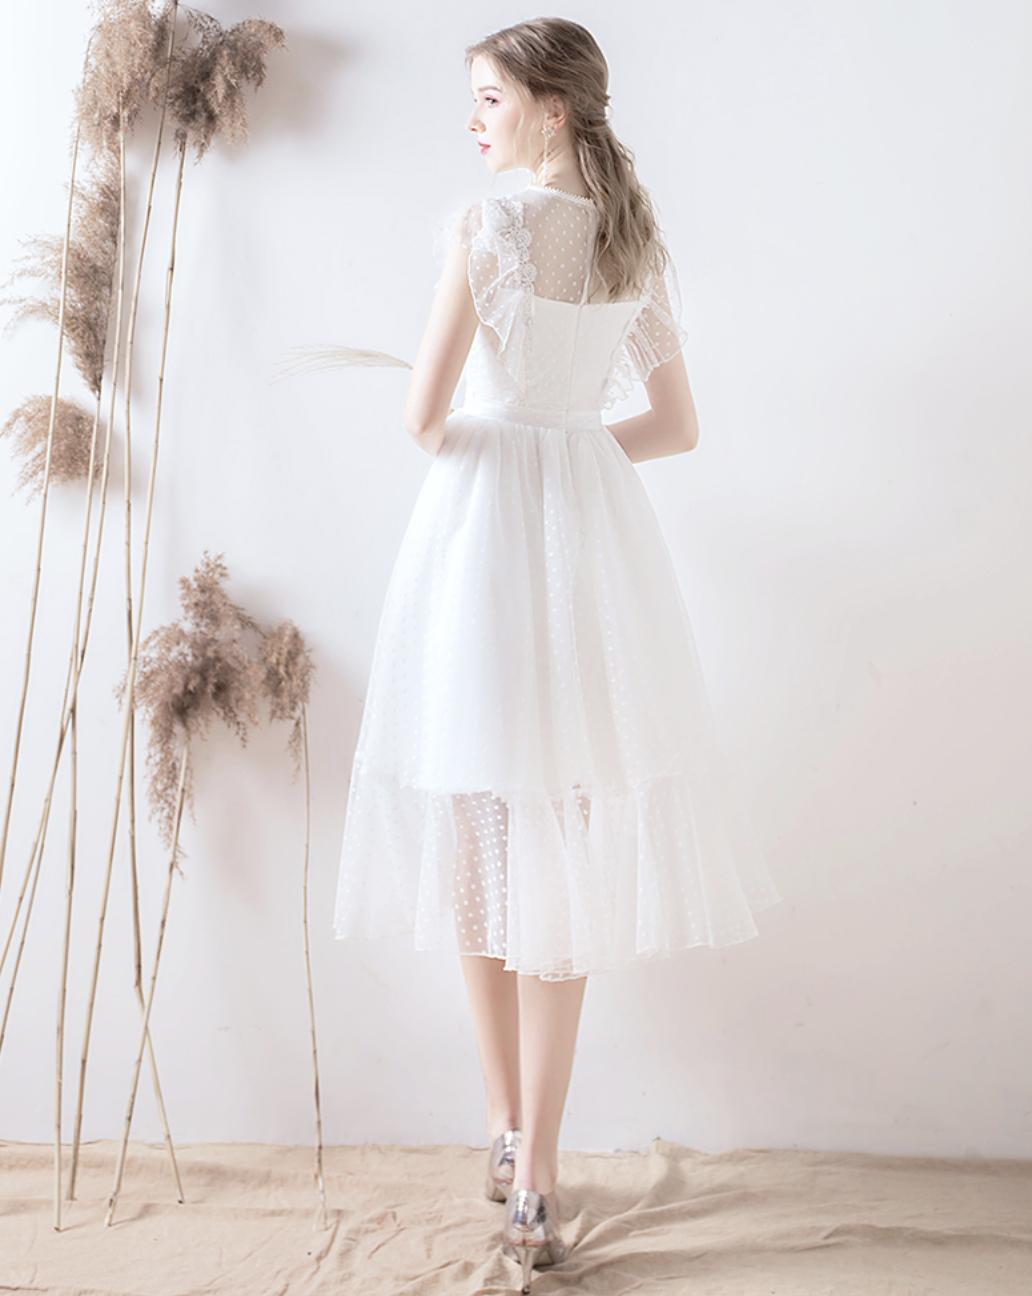 【DearWhite】ウェディングドレス Aライン プリンセス エンパイア デコルテ 結婚式 披露宴 二次会 パーティーウェディングドレス・カラードレス・サイズオーダー格安オーダーメイド DW00016